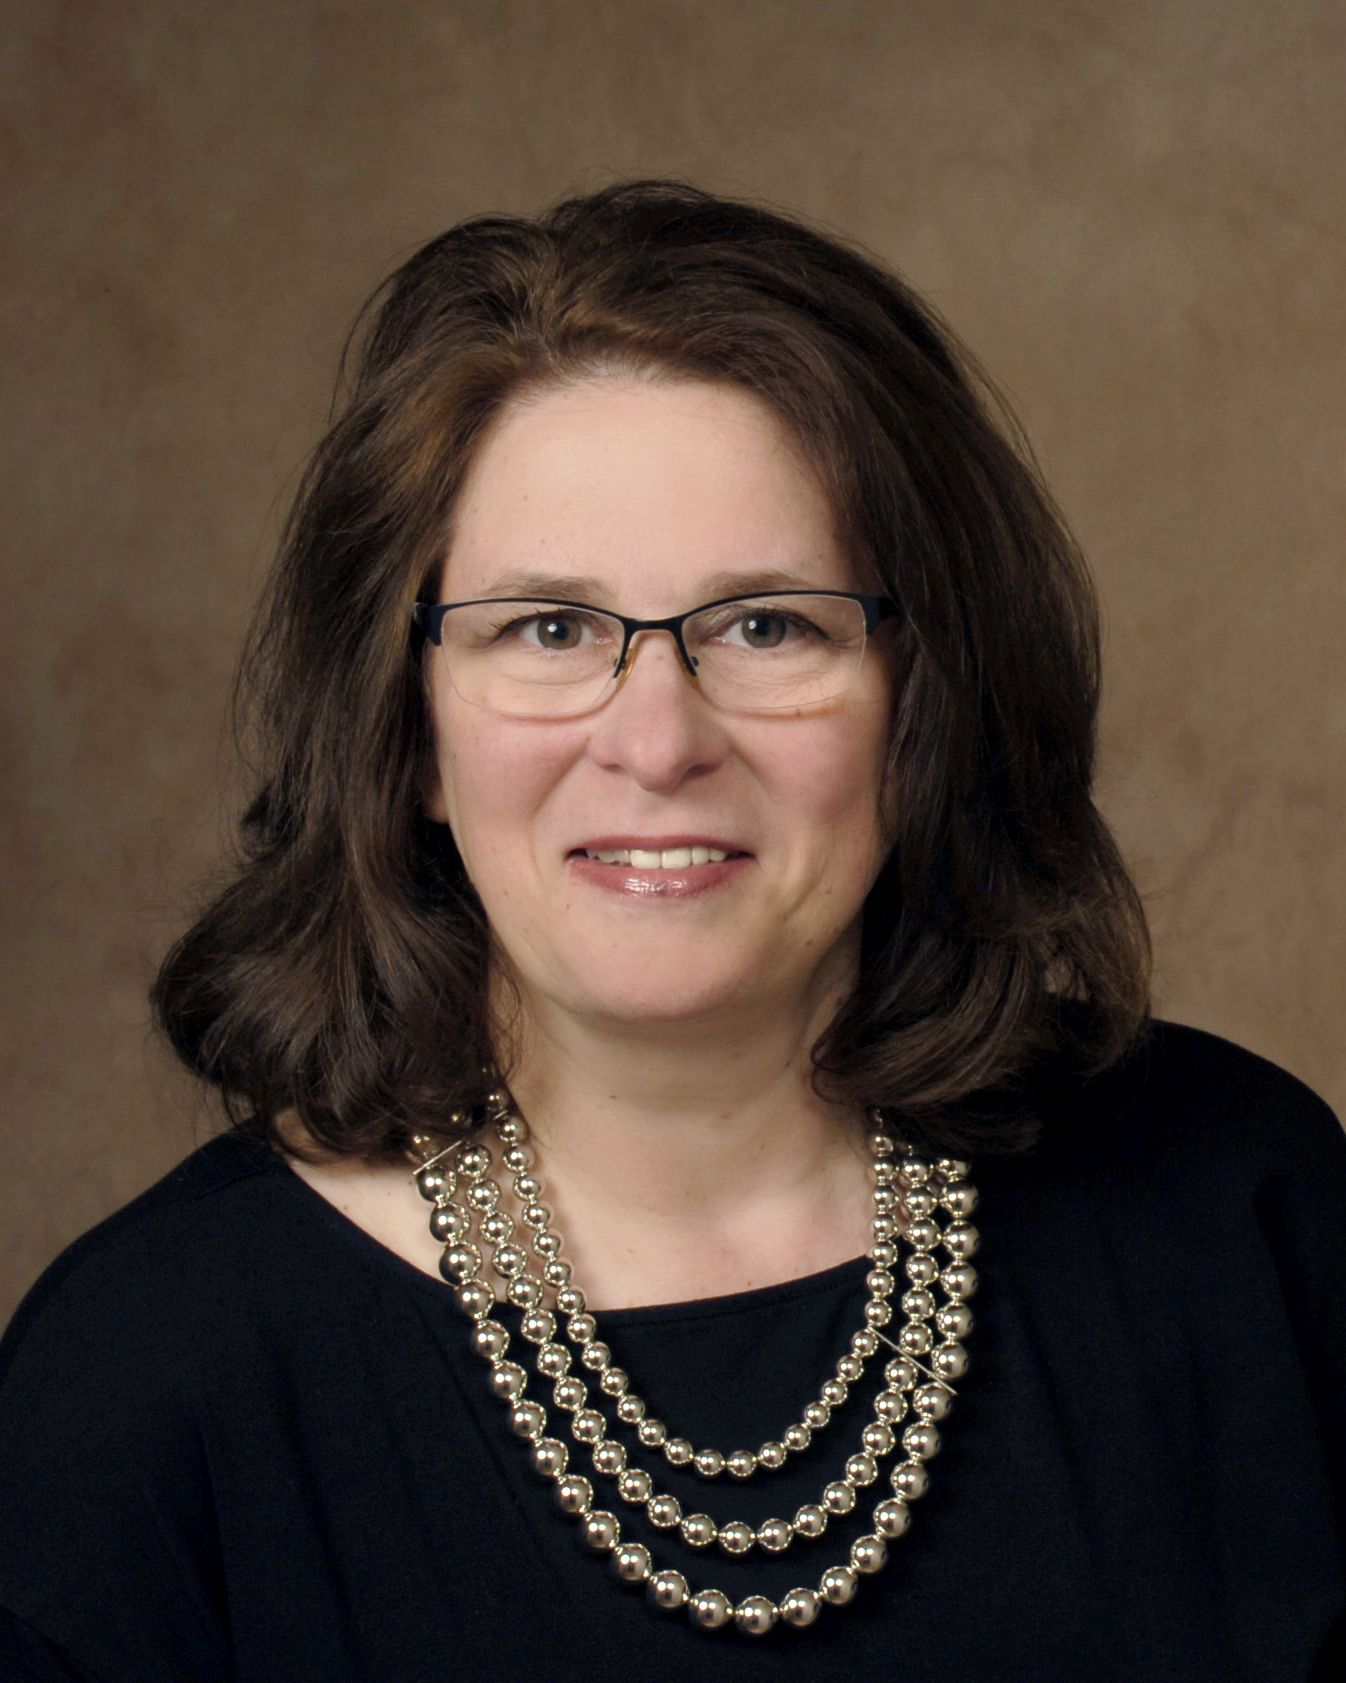 Susan R. Katzoff